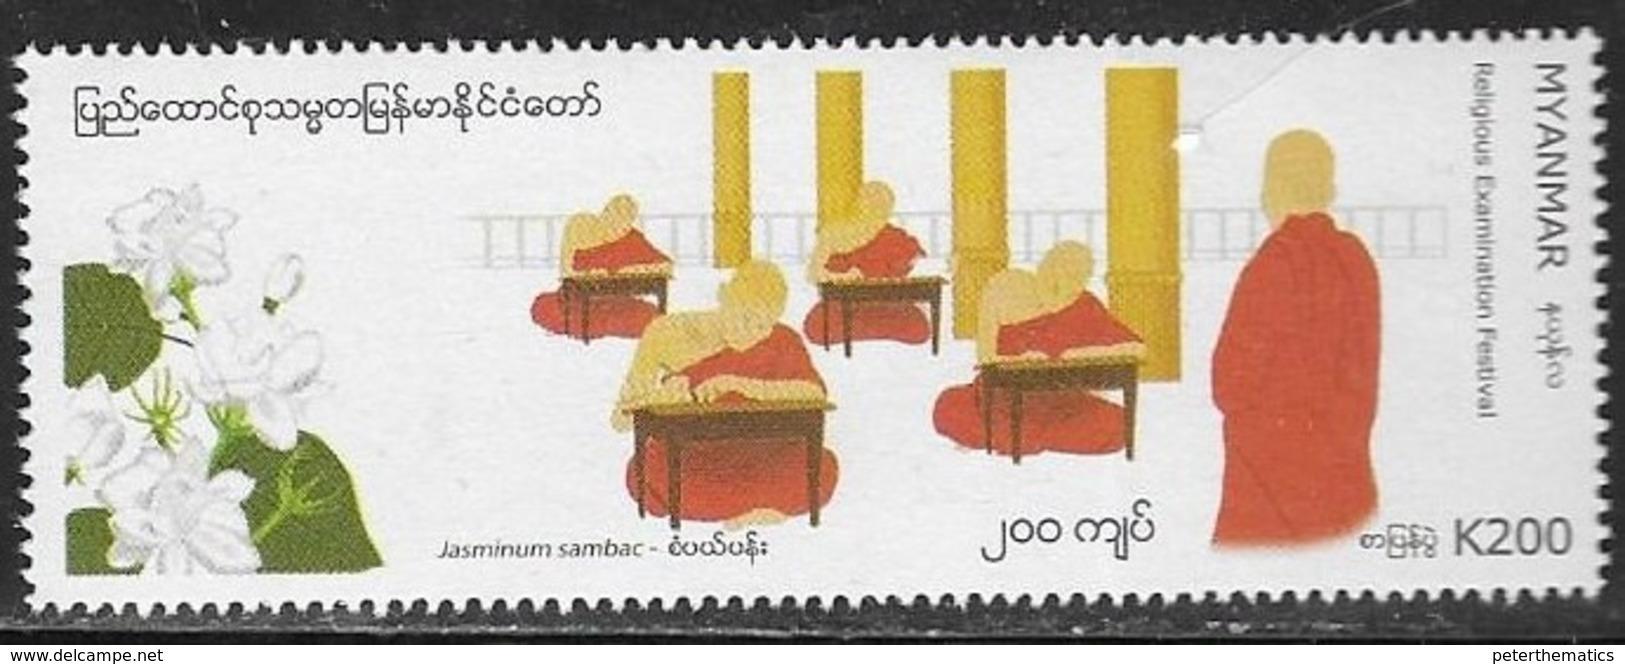 MYANMAR, 2019, MNH, FESTIVALS, RELIGIOUS EXAMINATION  FESTIVAL, FLOWERS, JASMINE,  1v - Celebrations